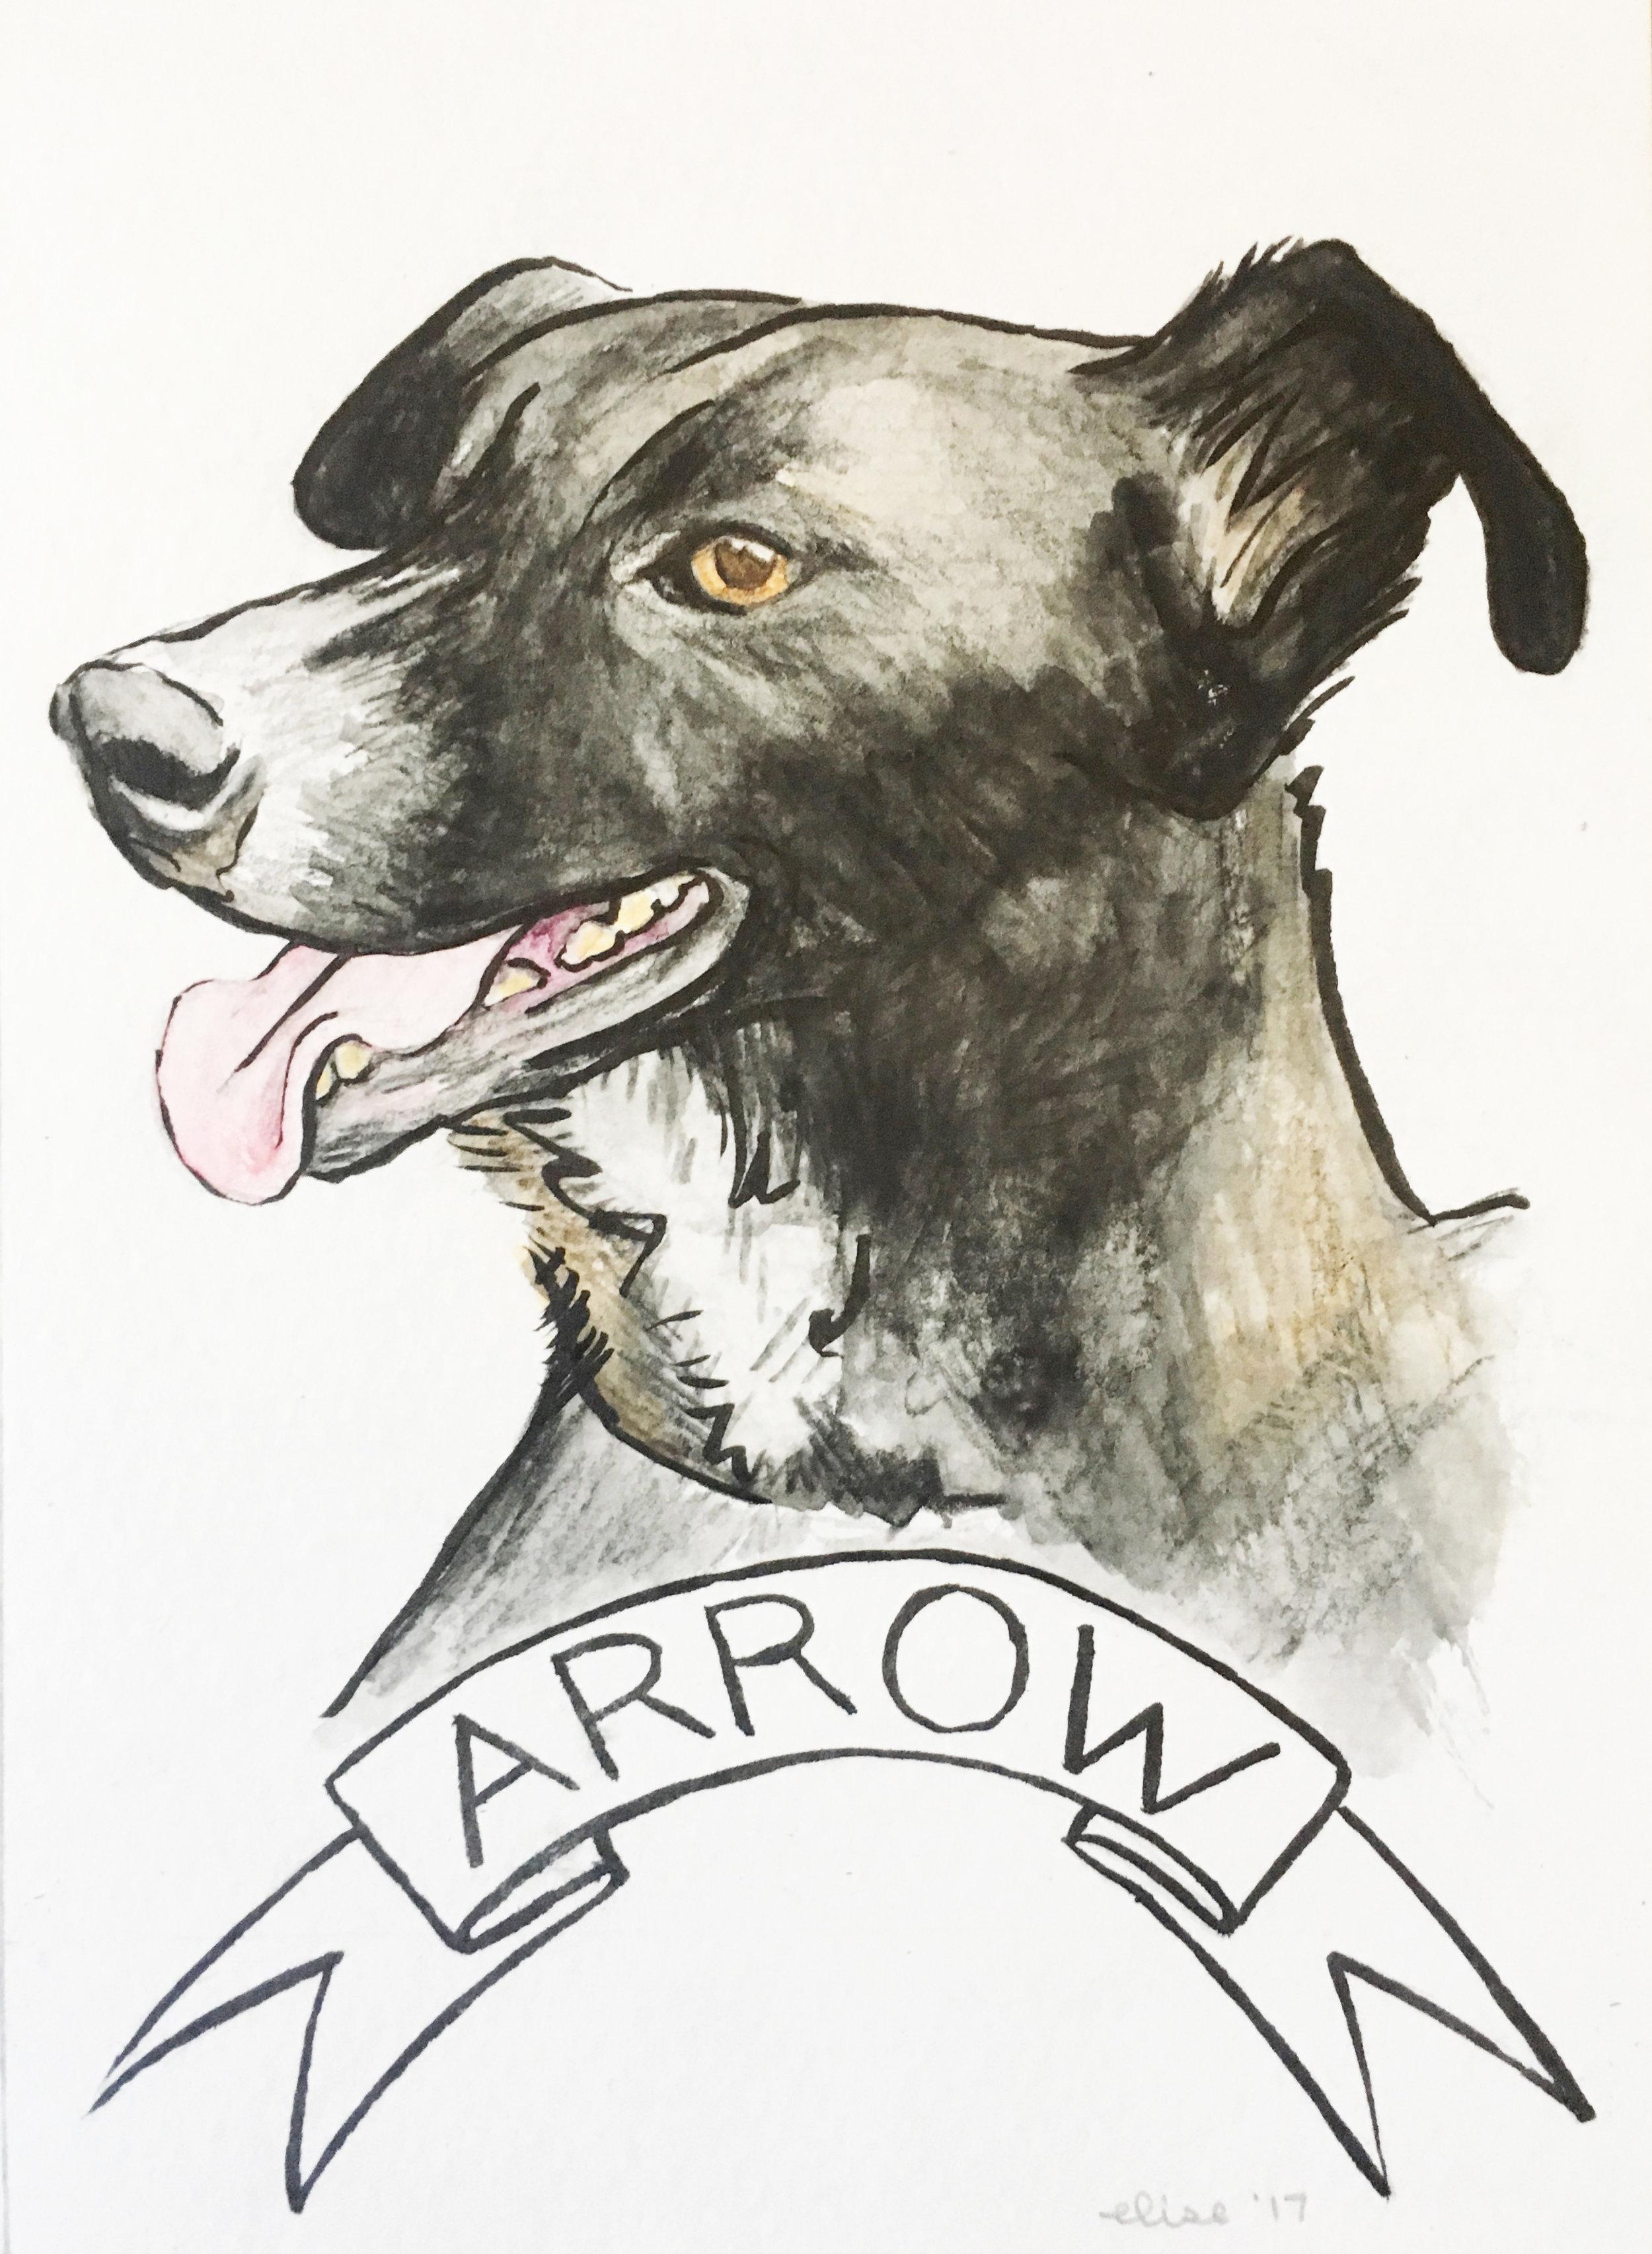 arrow-custom-watercolor-pet-portrait-drawing-elisemade-by-elise-lopez.jpg